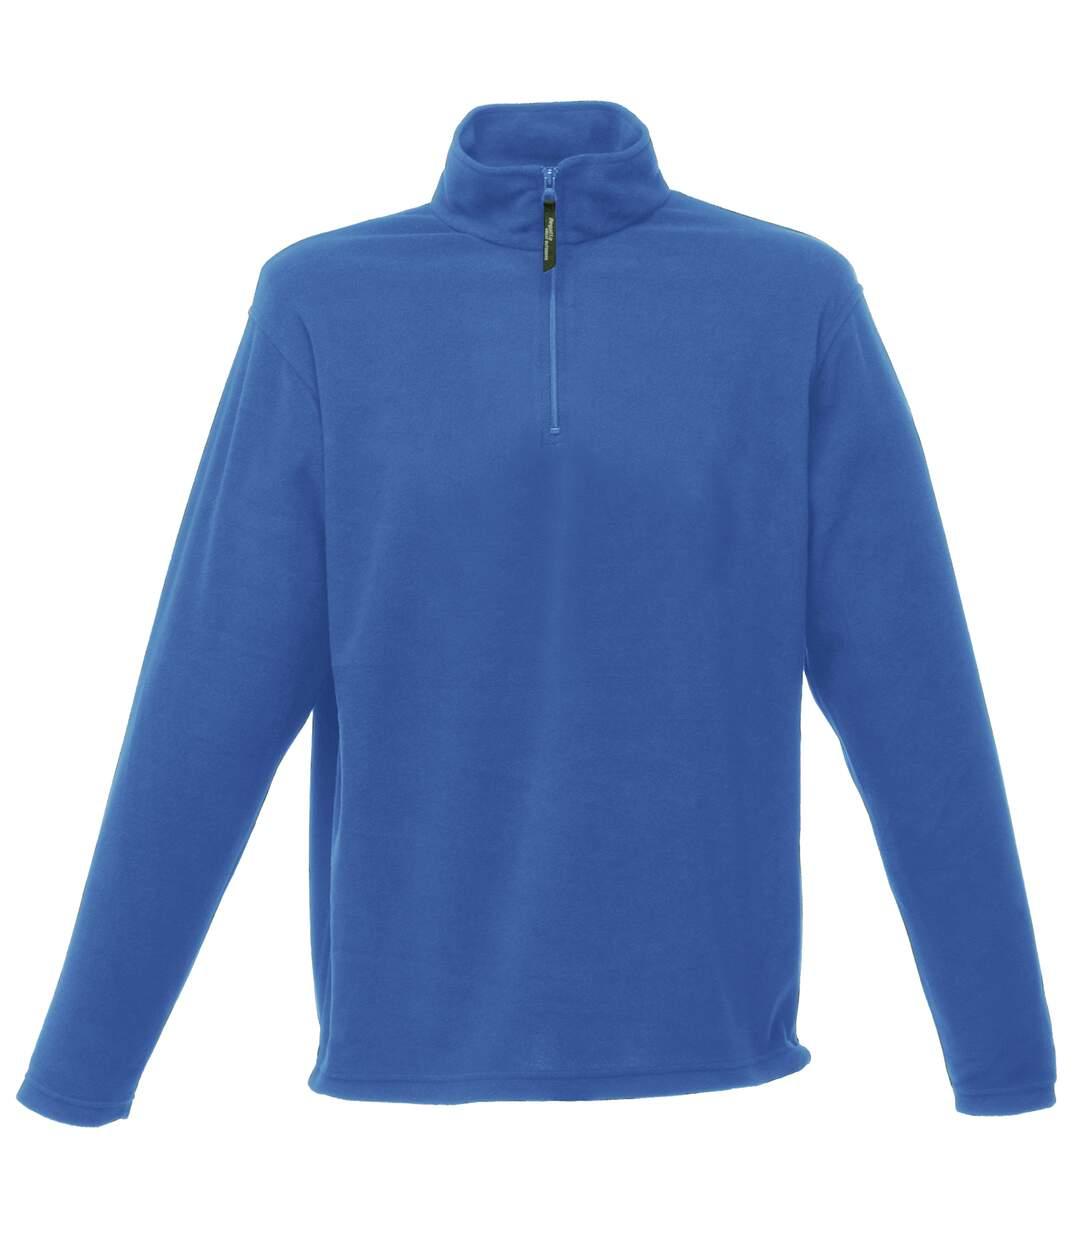 Regatta Mens 170 Series Anti-pill Zip Neck Micro Fleece Jacket (Oxford) - UTRW1207